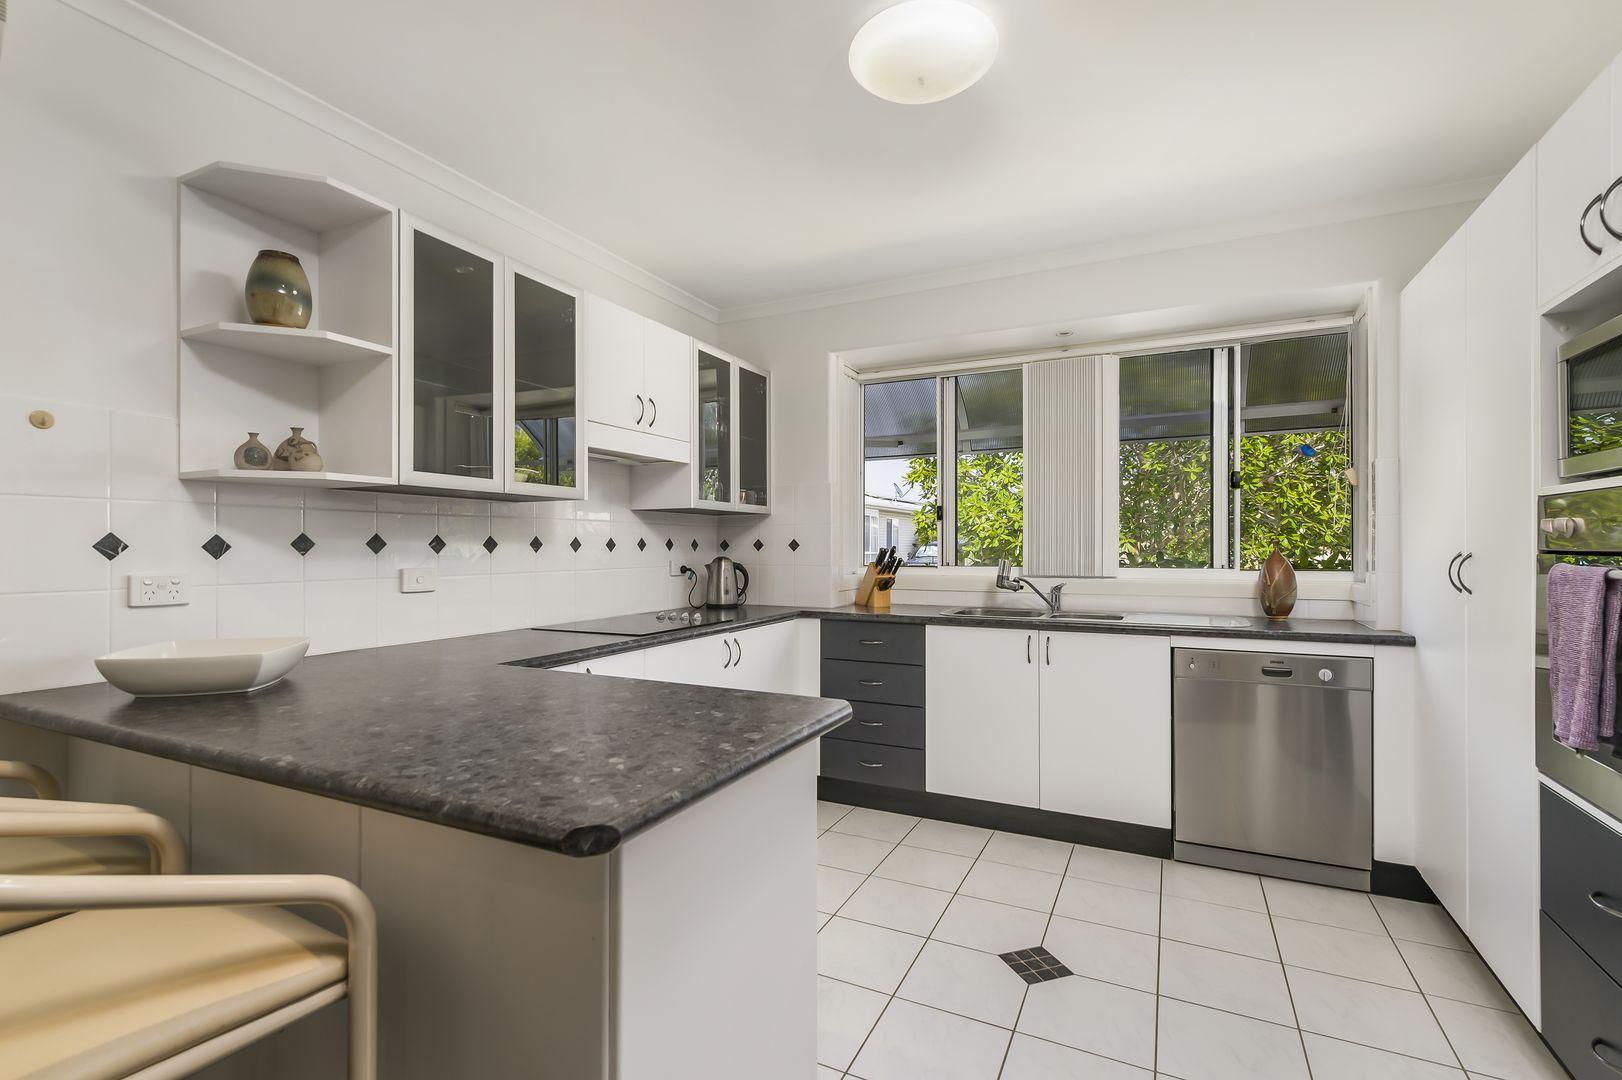 161/1 Greenmeadows Drive, Port Macquarie NSW 2444, Image 2